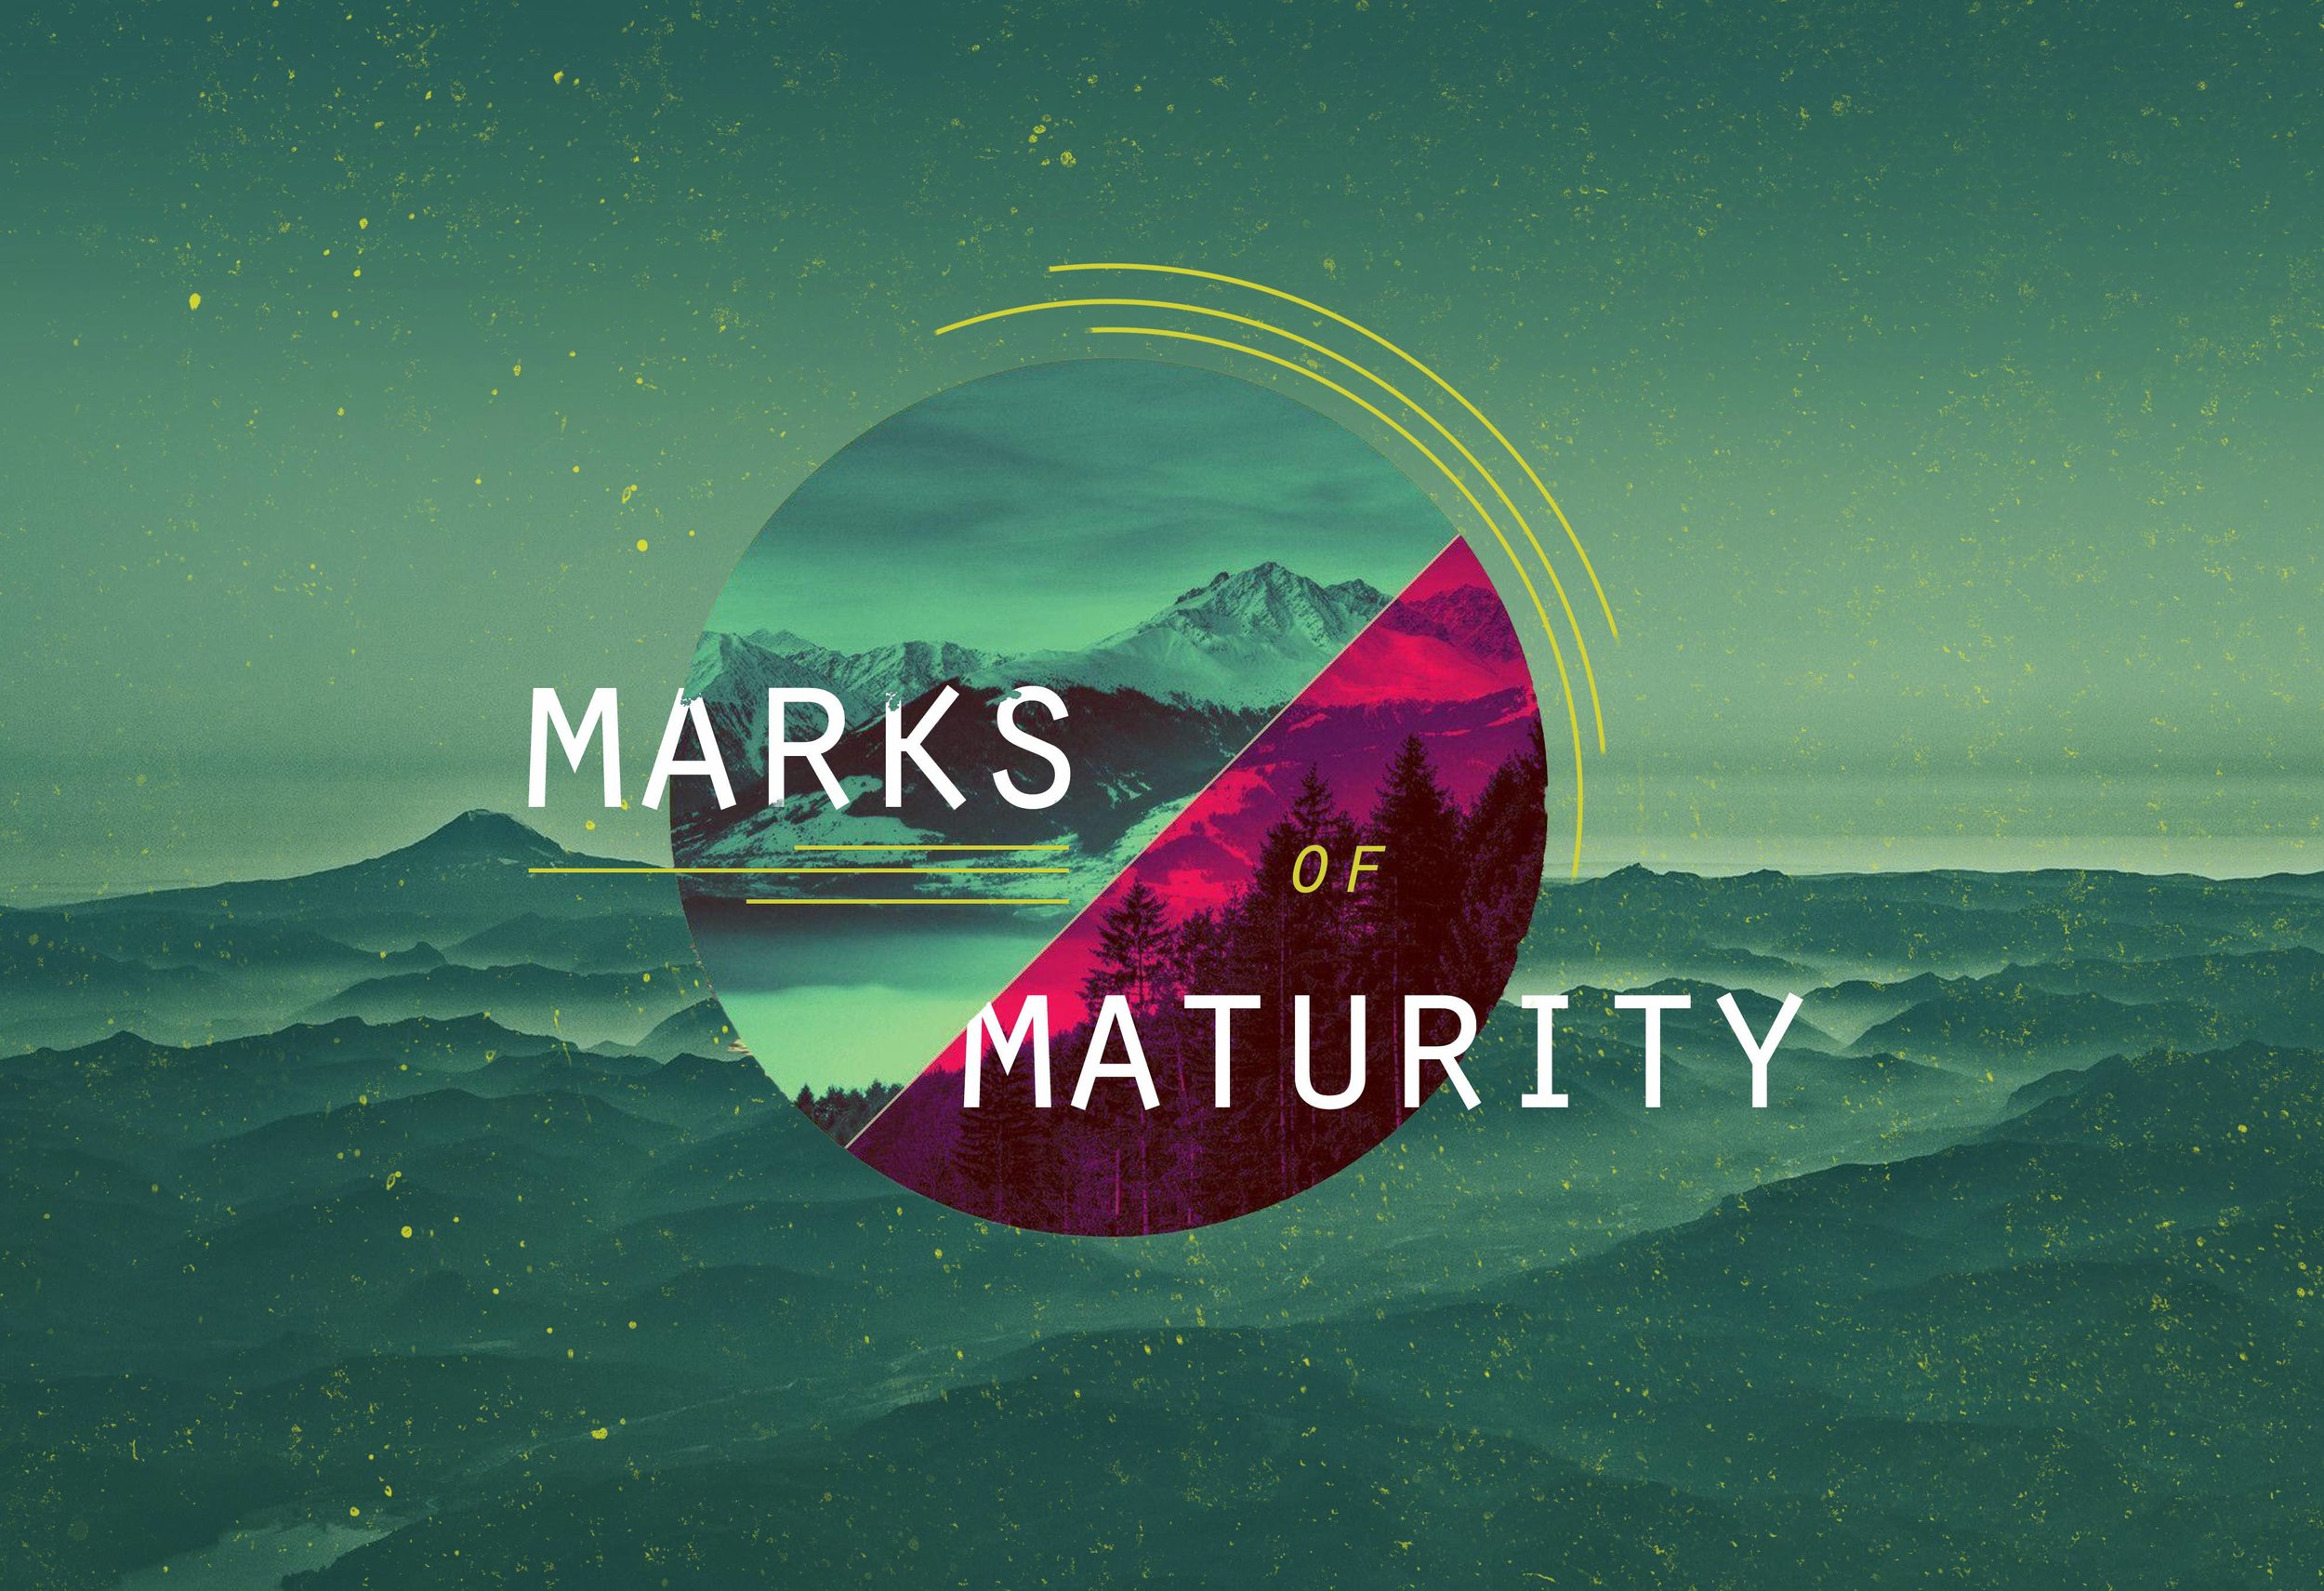 marksofmaturity_3.jpg